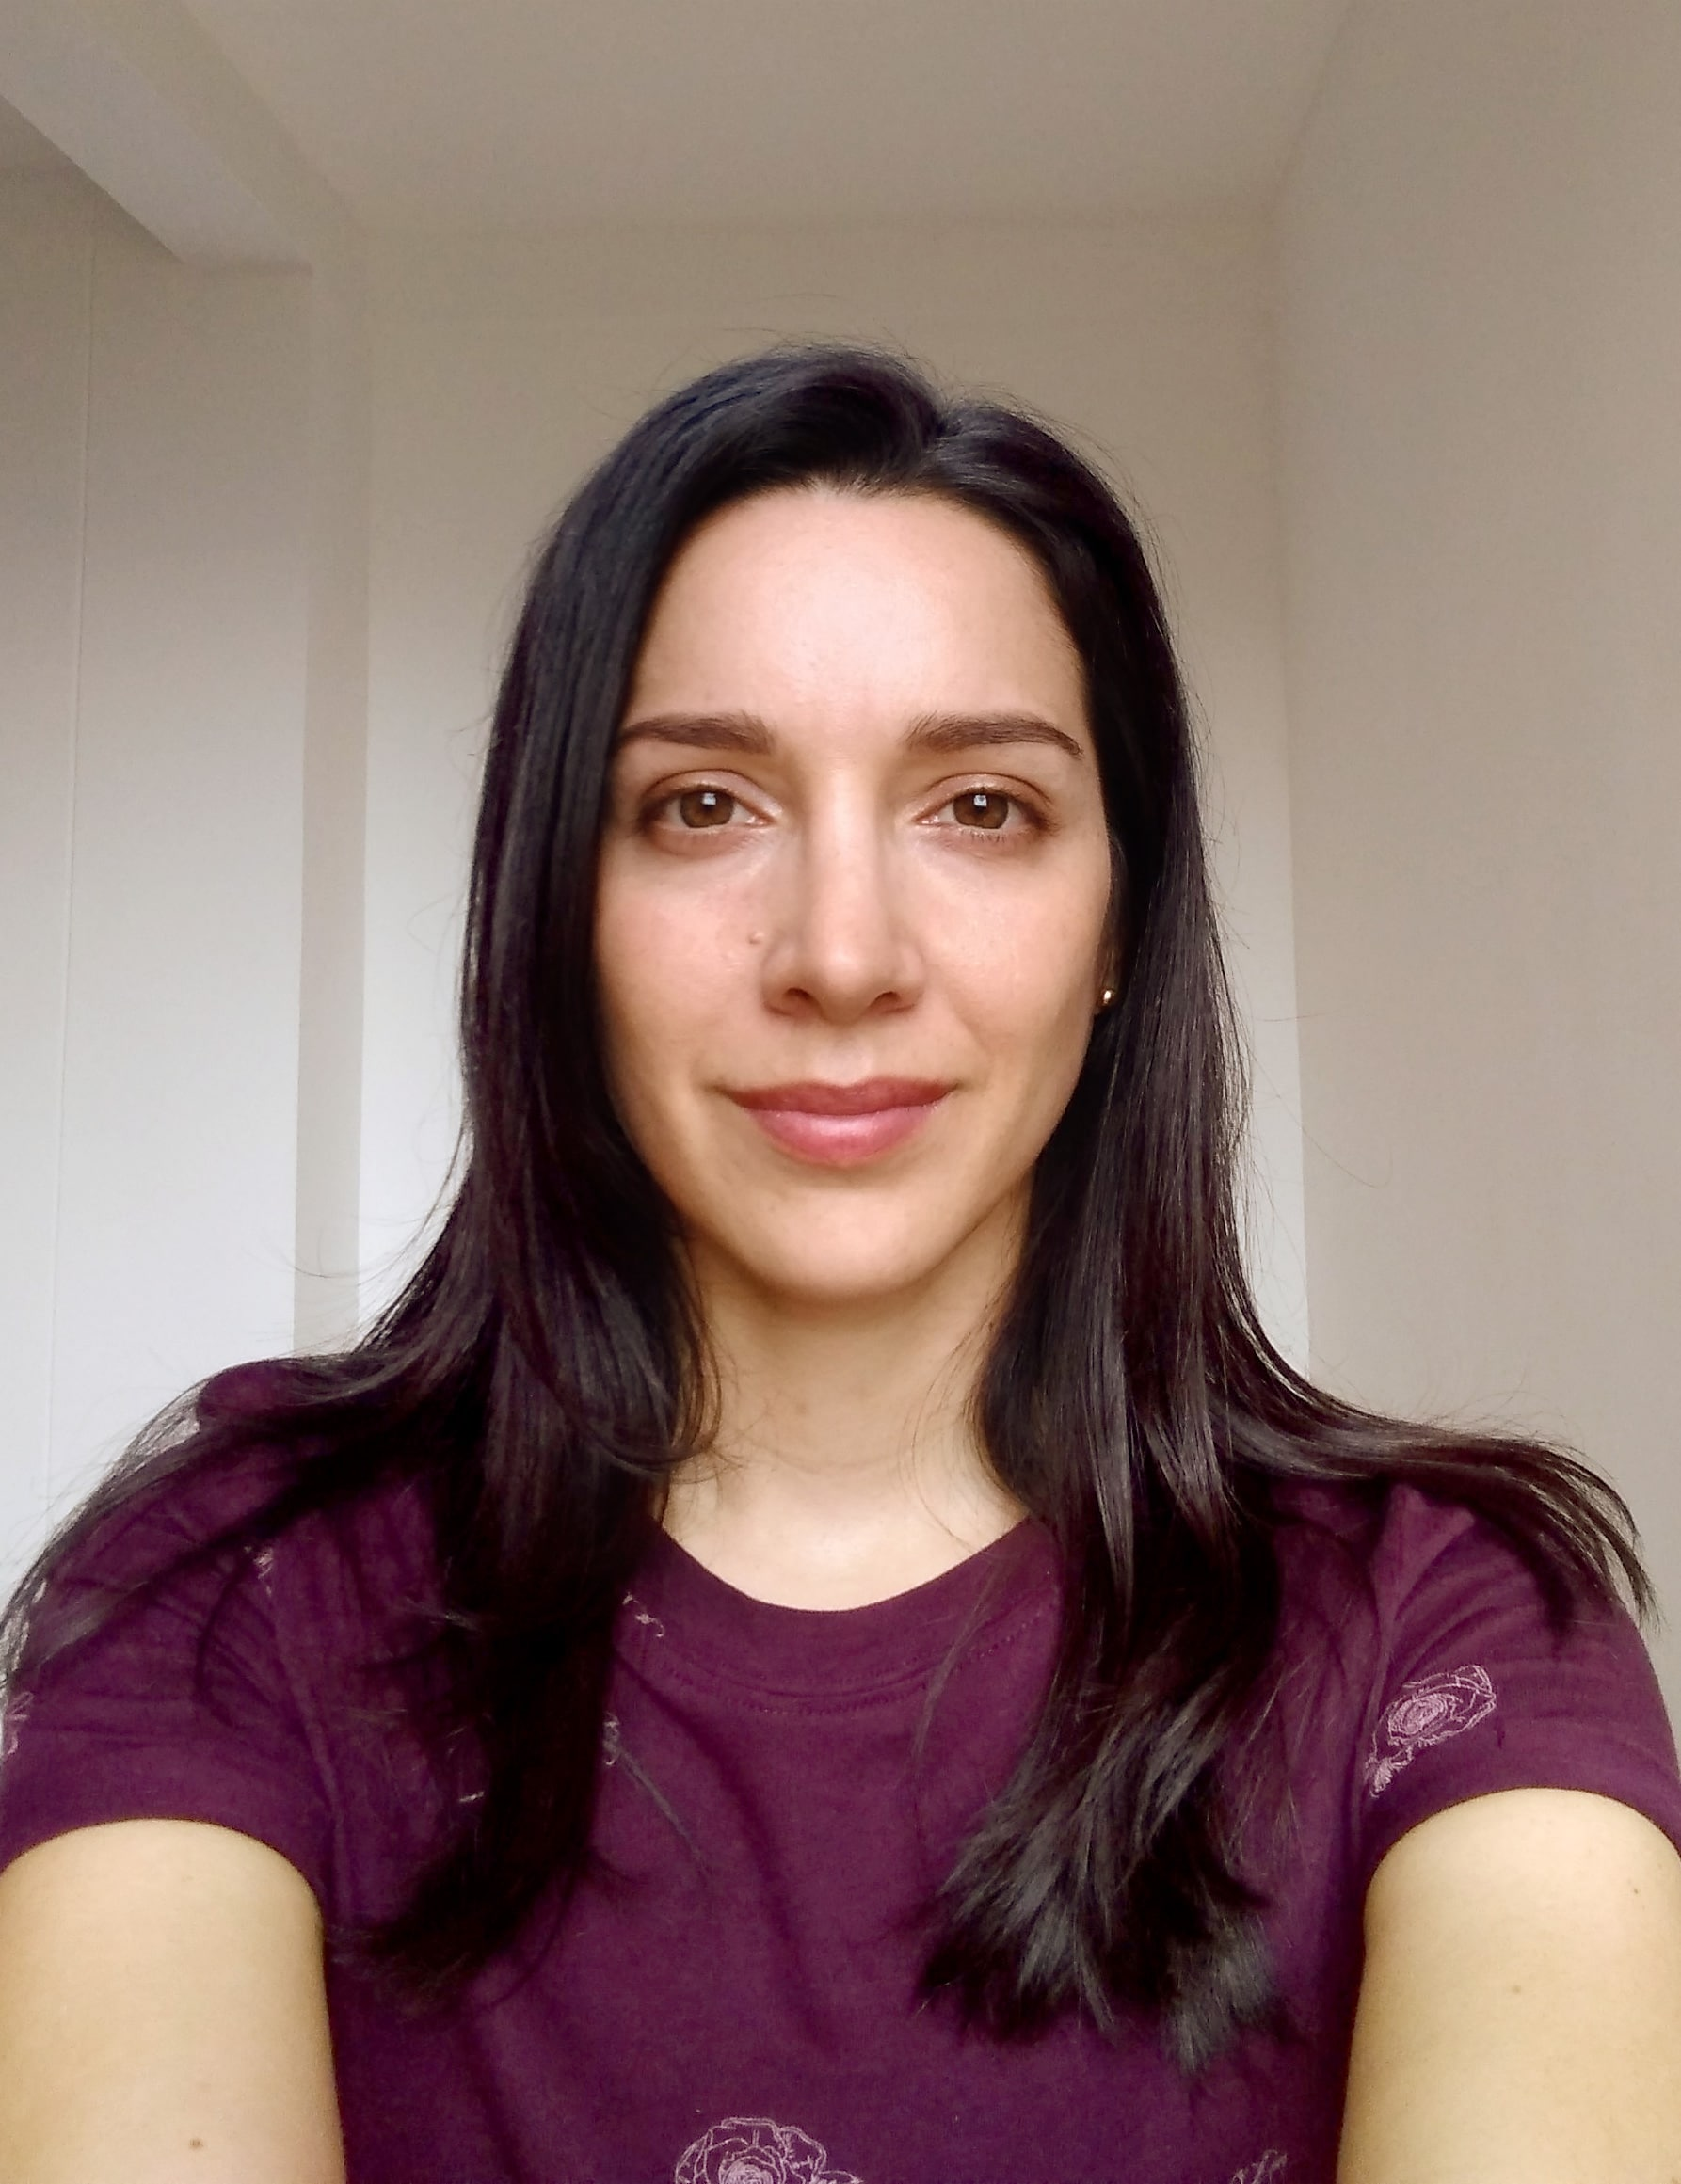 Jessica pacateque